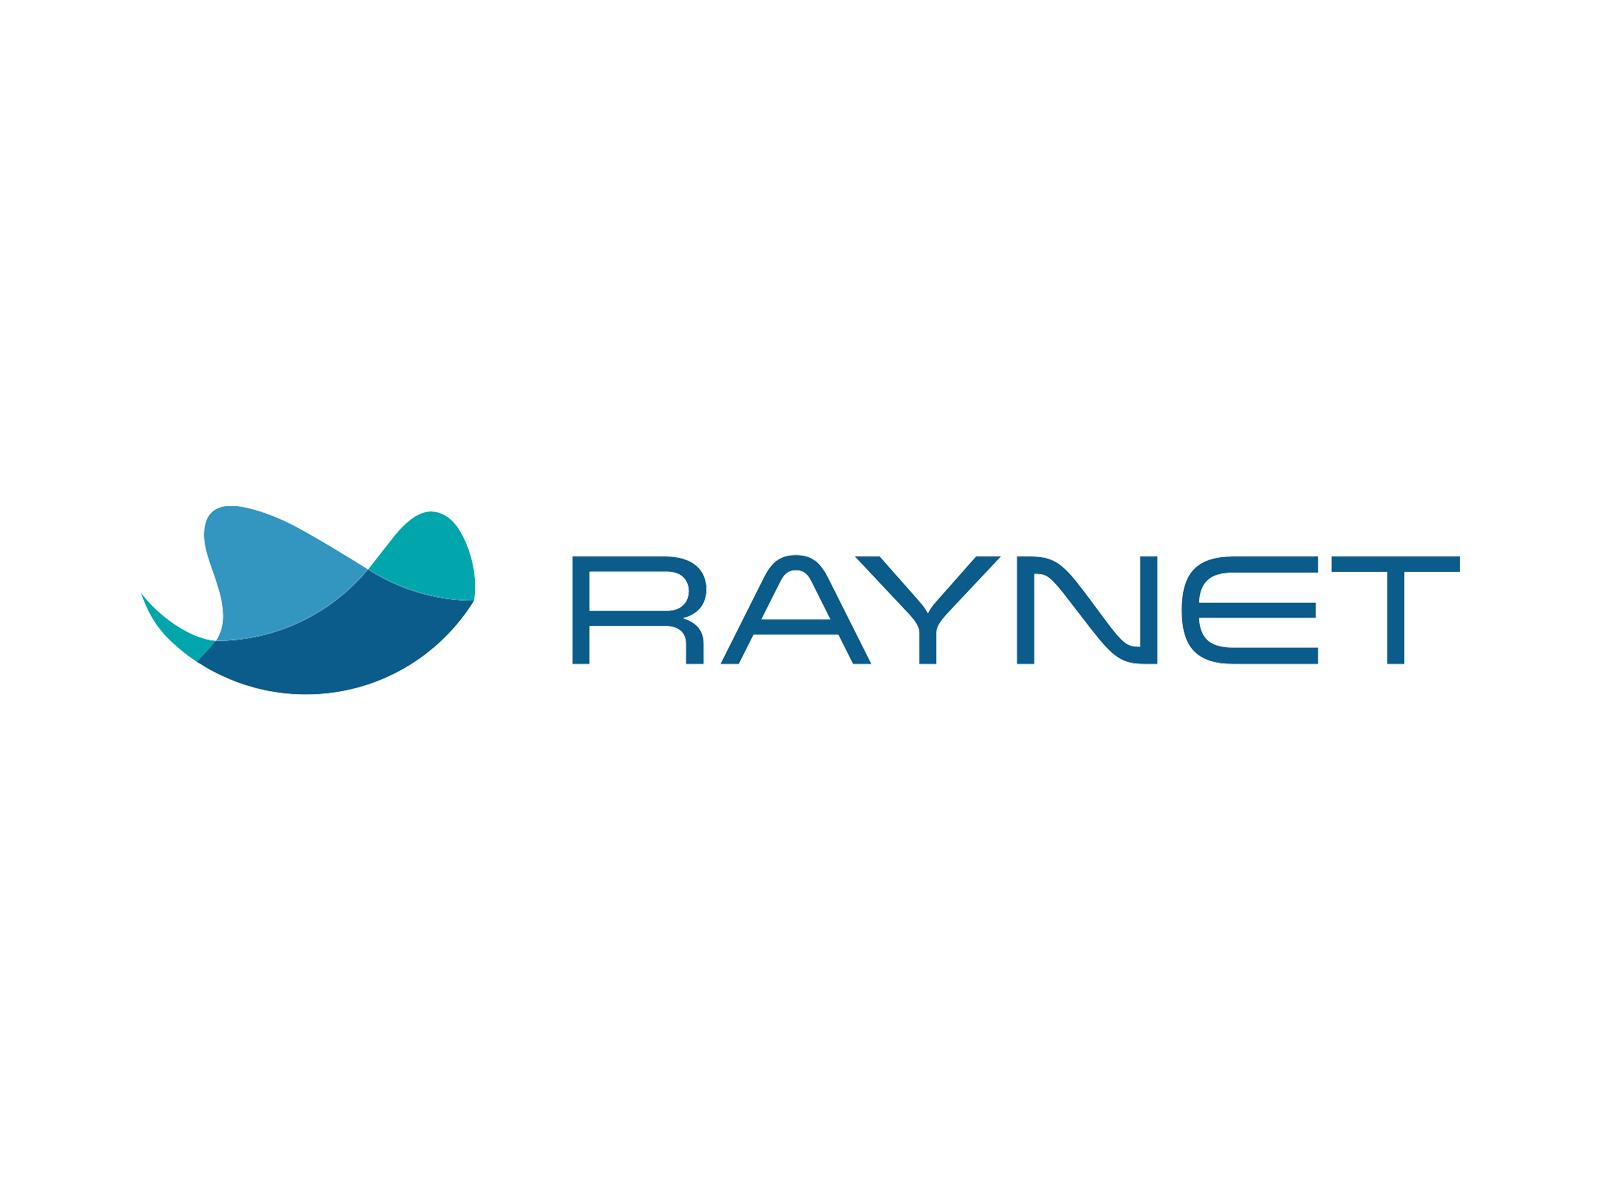 RAYNET CRM logo